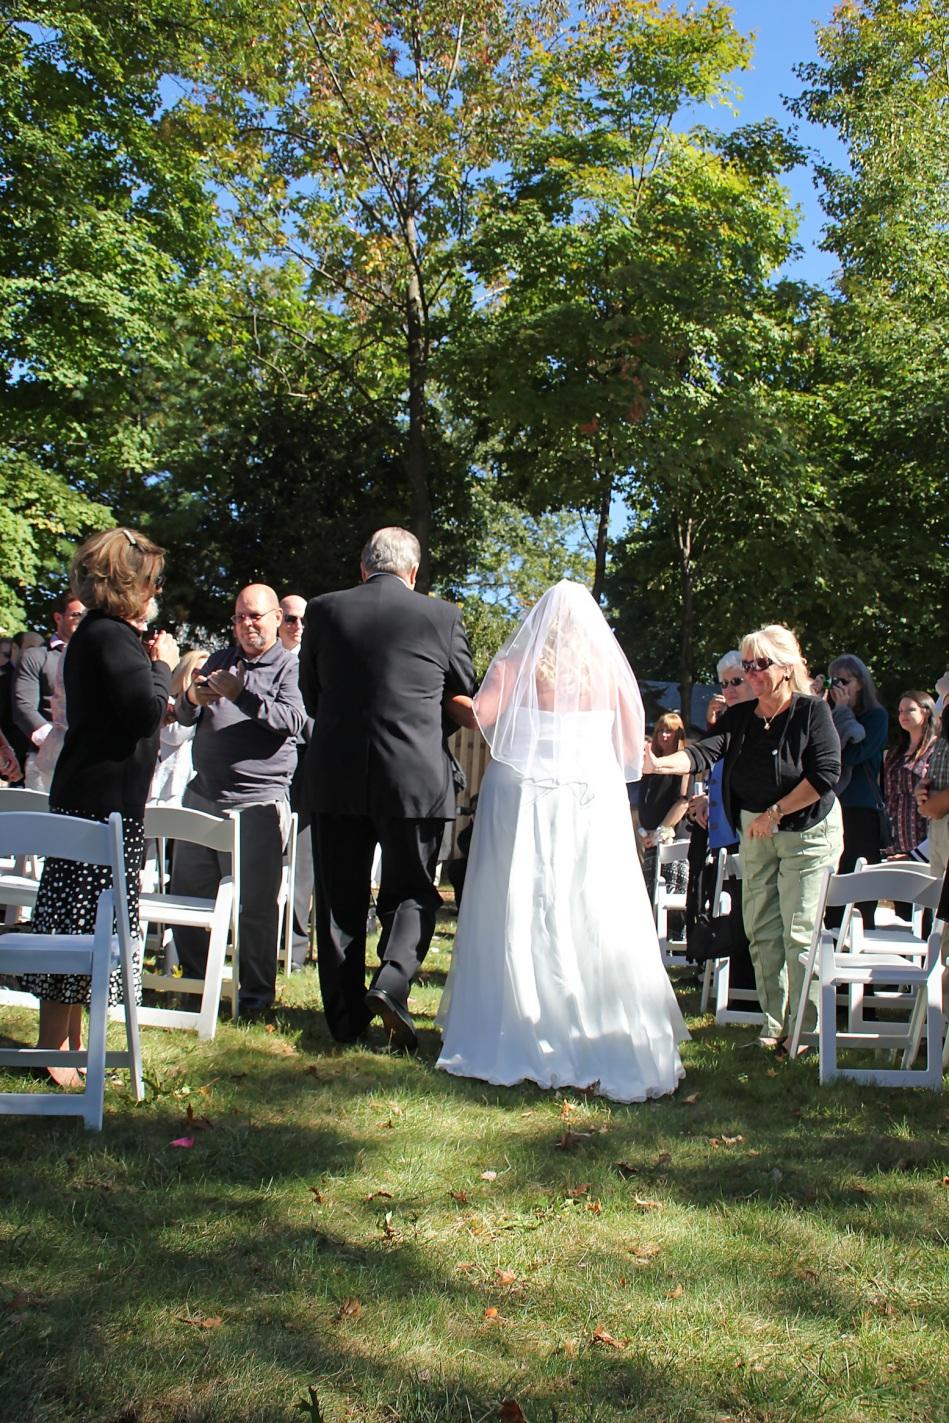 #bridedowntheaisle, #njwedding, #apicturesquememoryphotography, #weddings, #firefighterwedding, #pomptonlakesnjwedding, #backyardwedding, #bridesprocession